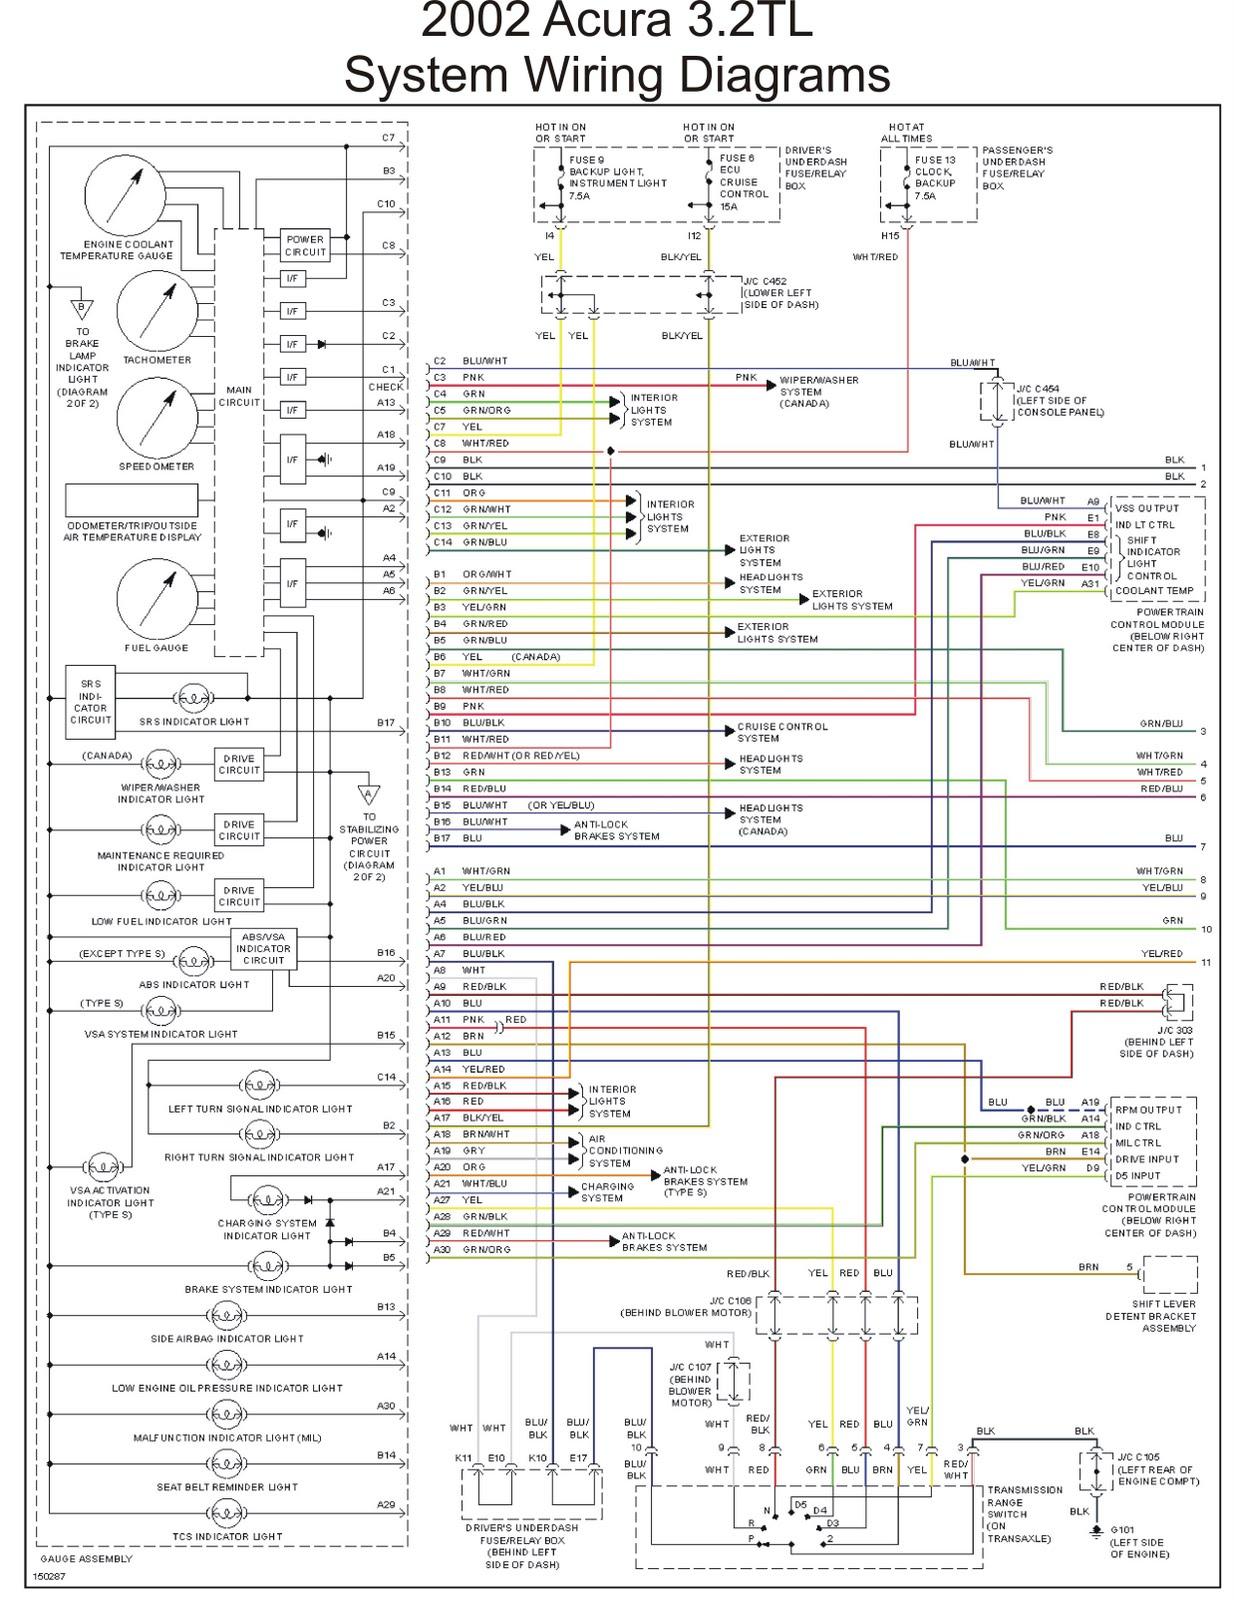 BX_5227] Radio Wiring Diagram As Well As Mitsubishi Montero Sport Radio  Wiring Free Diagram | Acura Legend Radio Wiring |  | Syny Verr Anal Inst Aryon Sapebe Numap Cette Mohammedshrine Librar Wiring  101